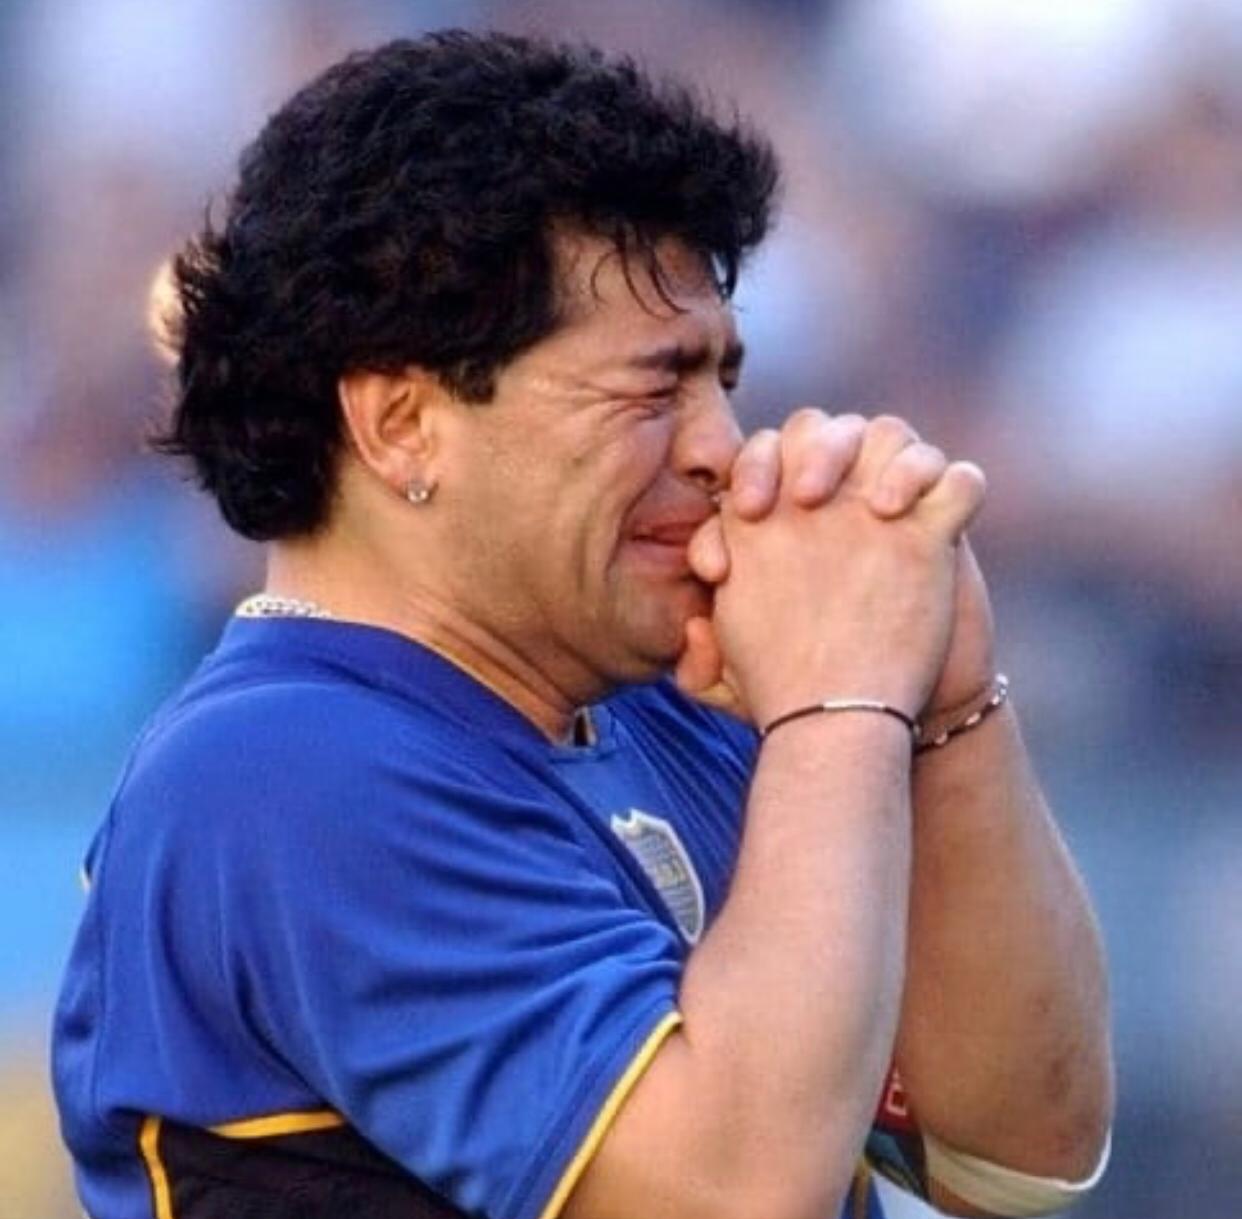 Murió el exfutbolista argentino Diego Armando Maradona